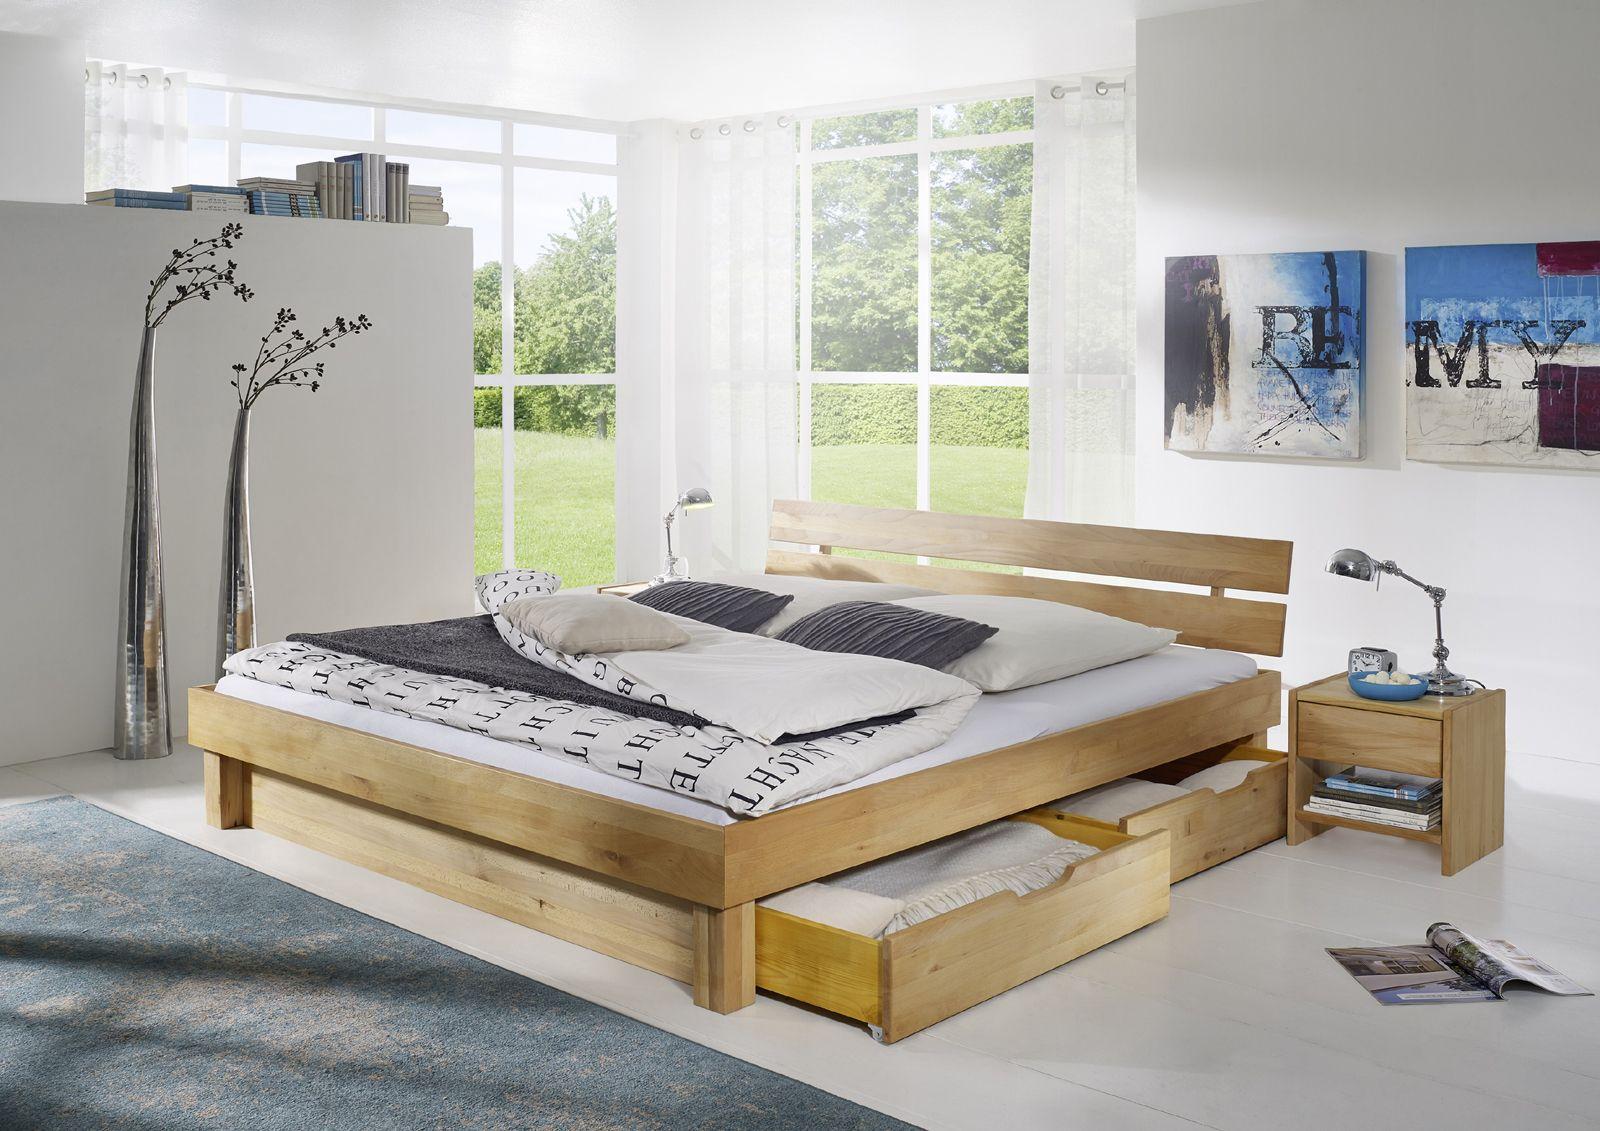 SAM® Massivholzbett 180 cm geteilt Kernbuche Bettkästen